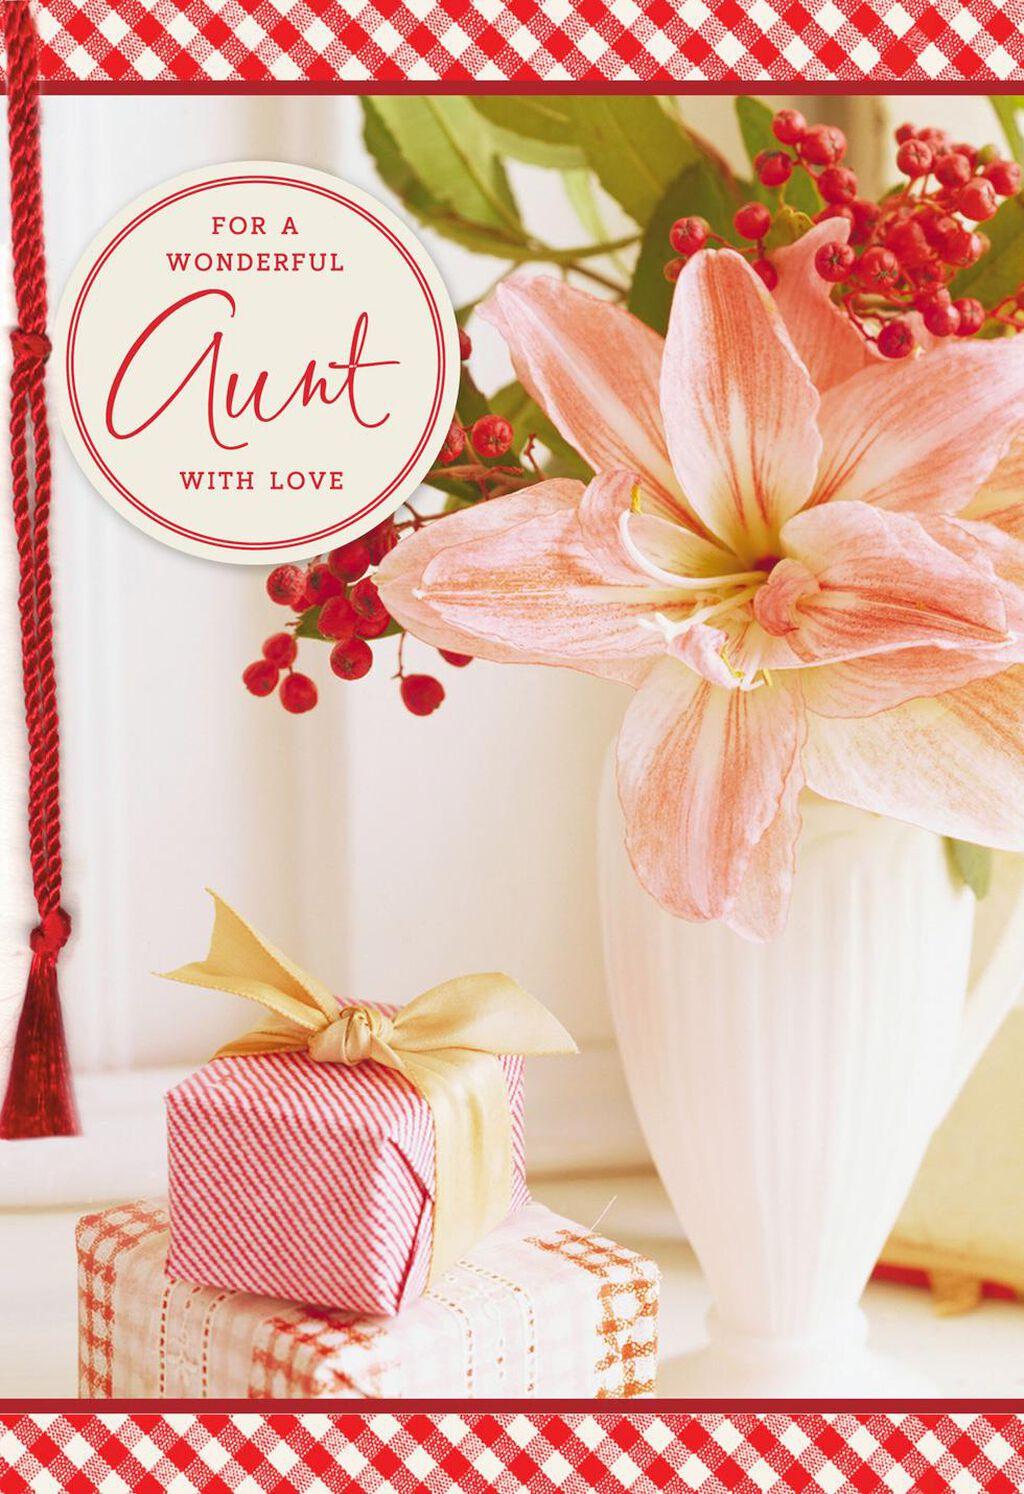 Sending My Love Christmas Card For Aunt Greeting Cards Hallmark